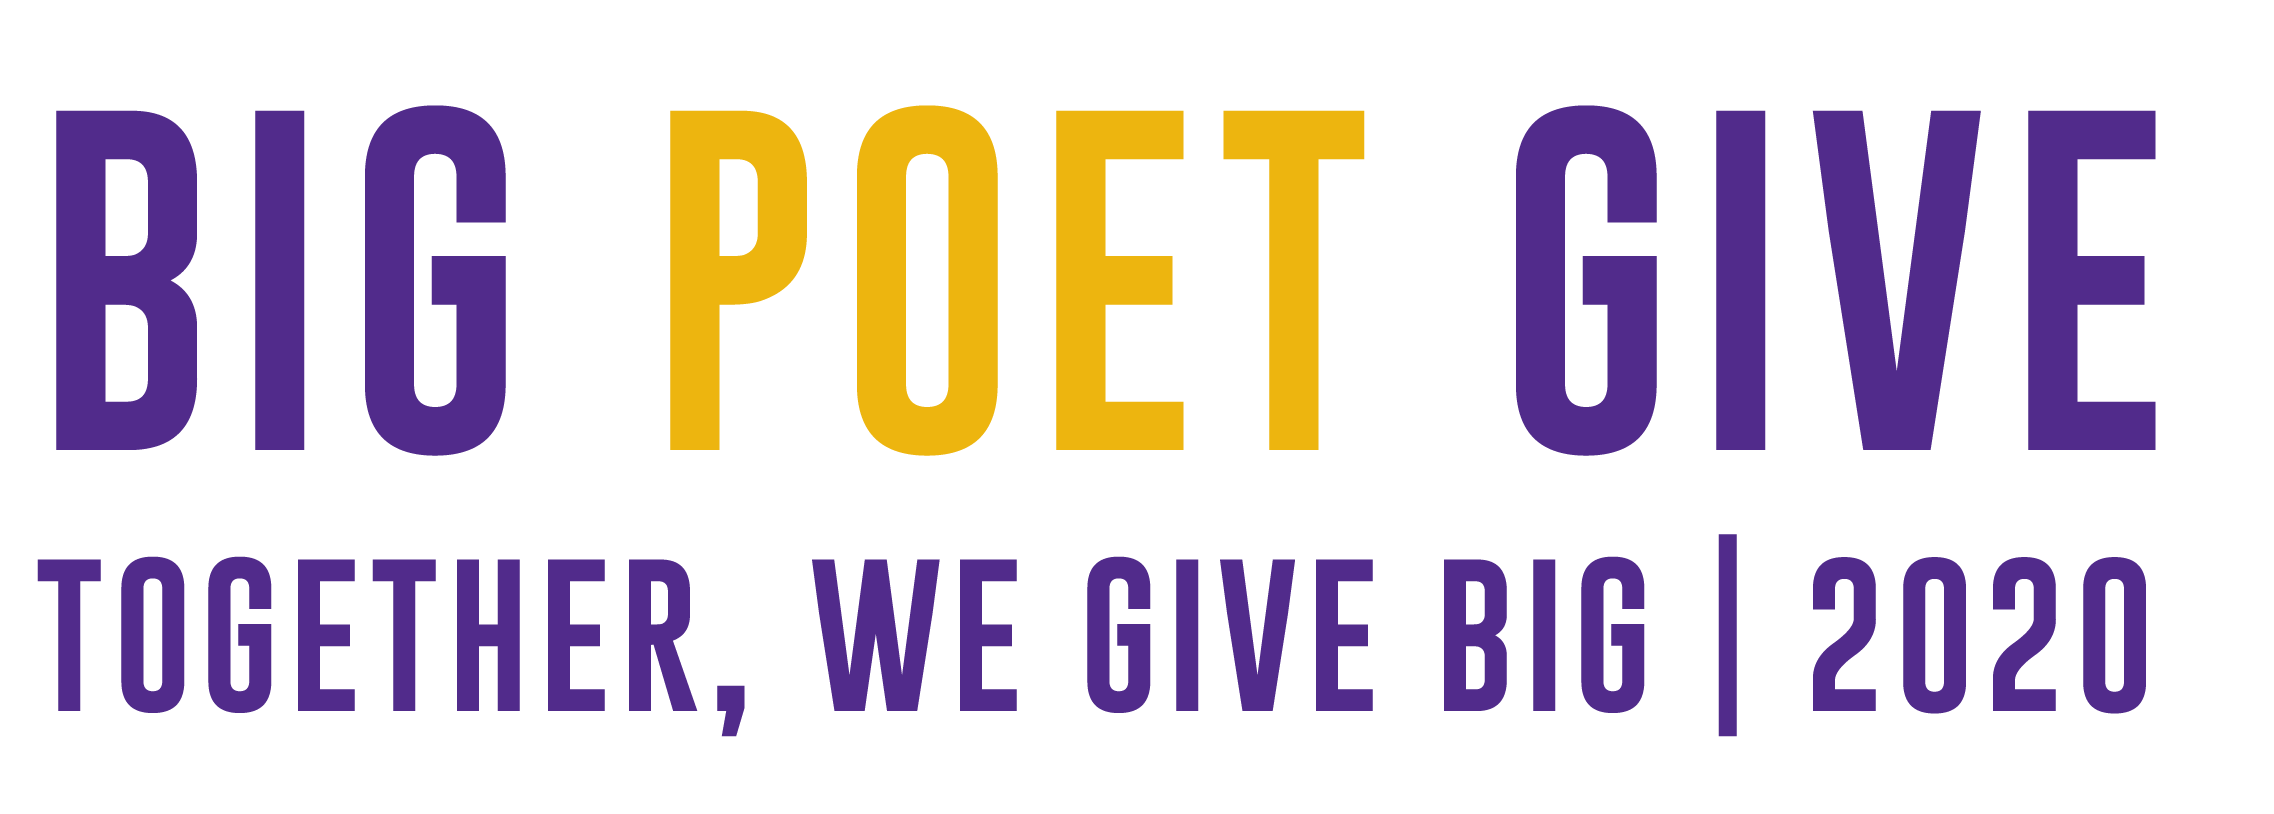 Big Poet Give Banner